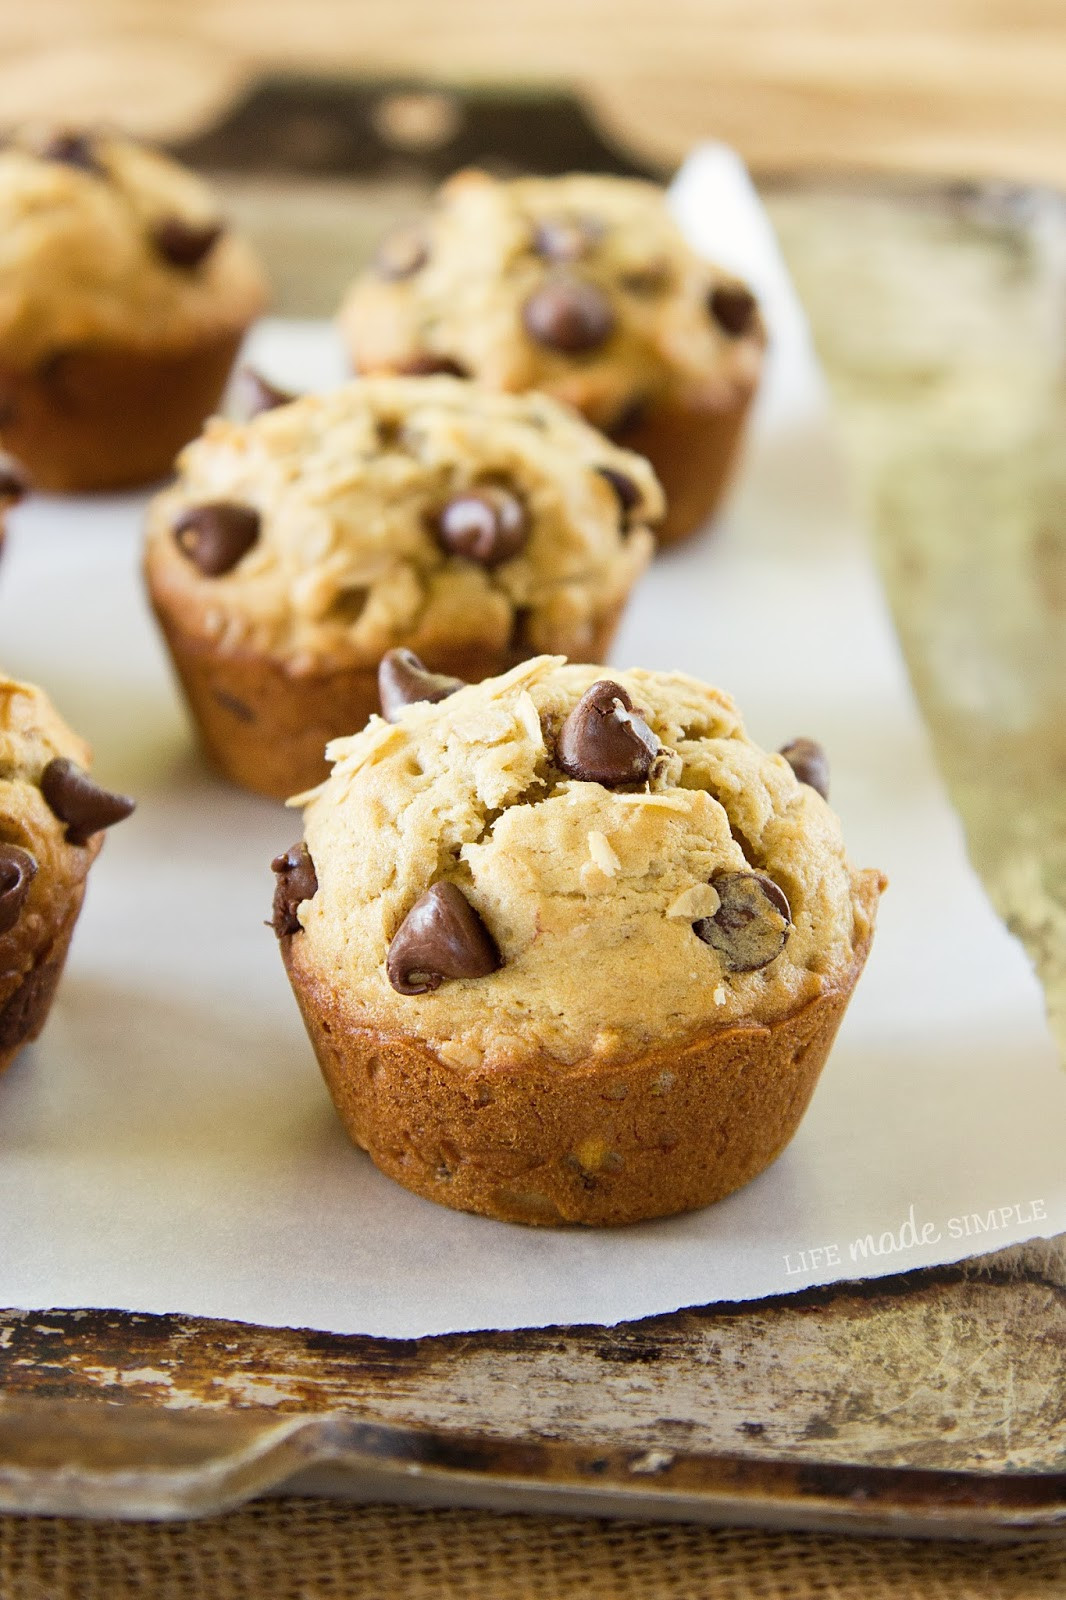 Healthy Banana Oatmeal Chocolate Chip Muffins  Oatmeal Chocolate Chip Banana Muffins Life Made Simple